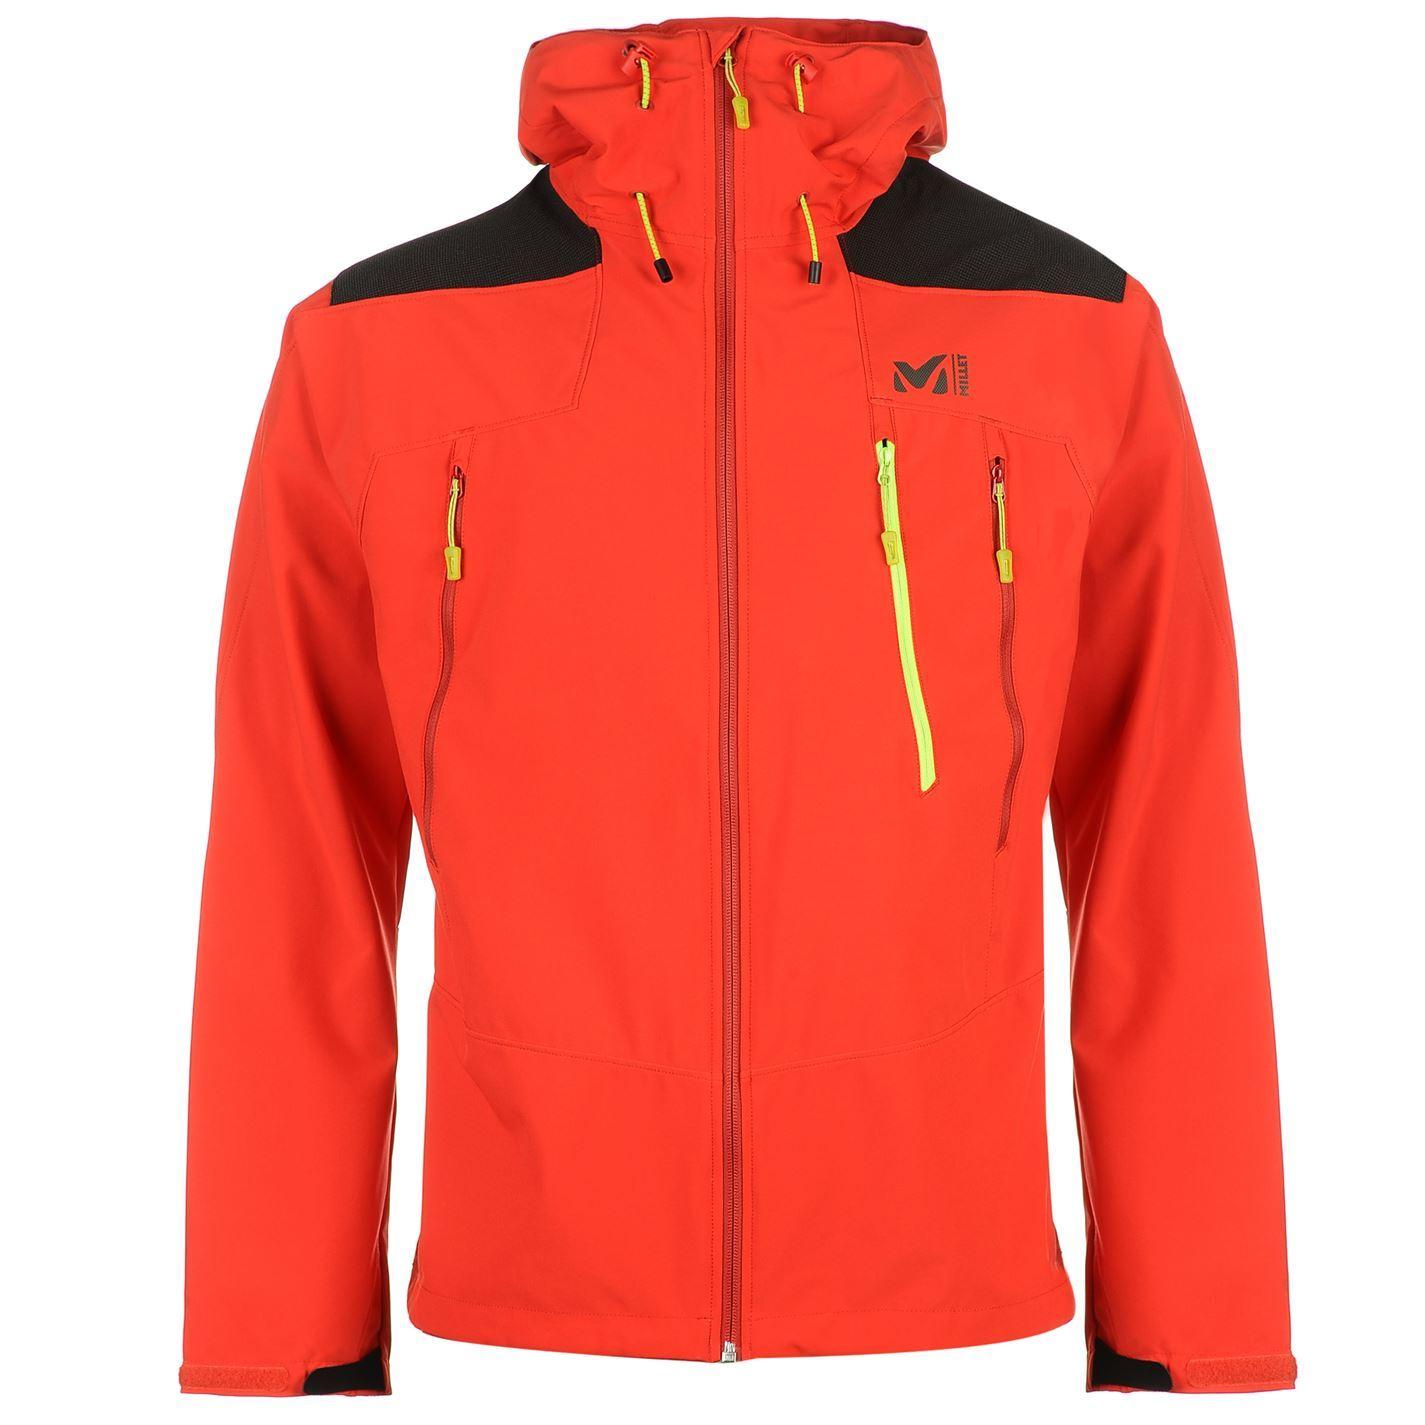 434e873ad94 Millet Mens K Shield Softshell Jacket Top Coat Windproof Water ...